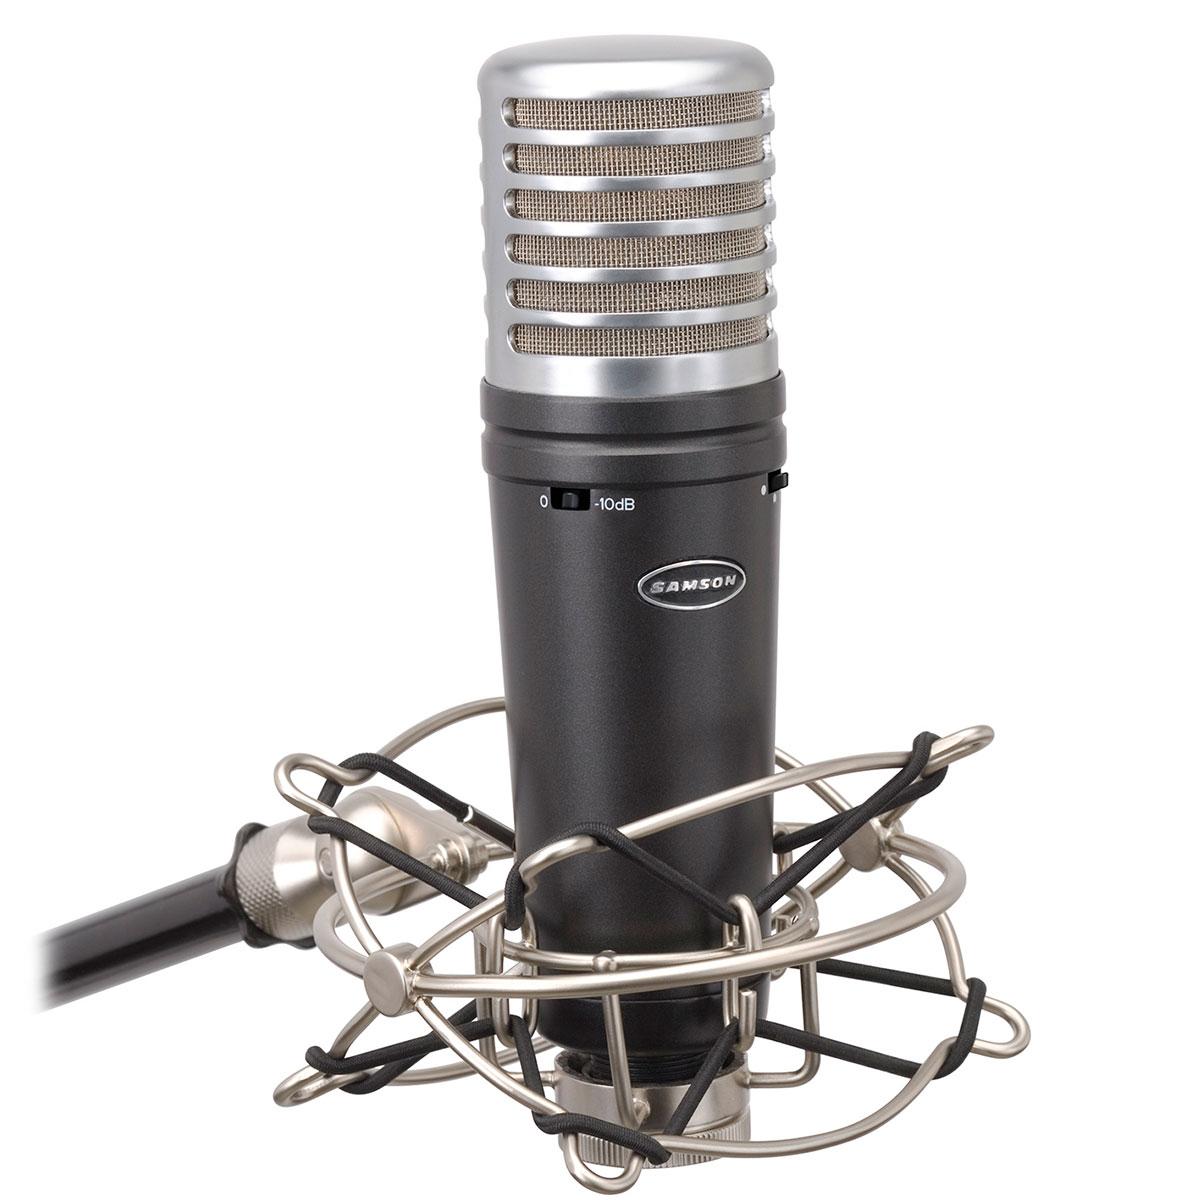 MTR231A - Microfone c/ Fio p/ Estúdio MTR 231 A - Samson